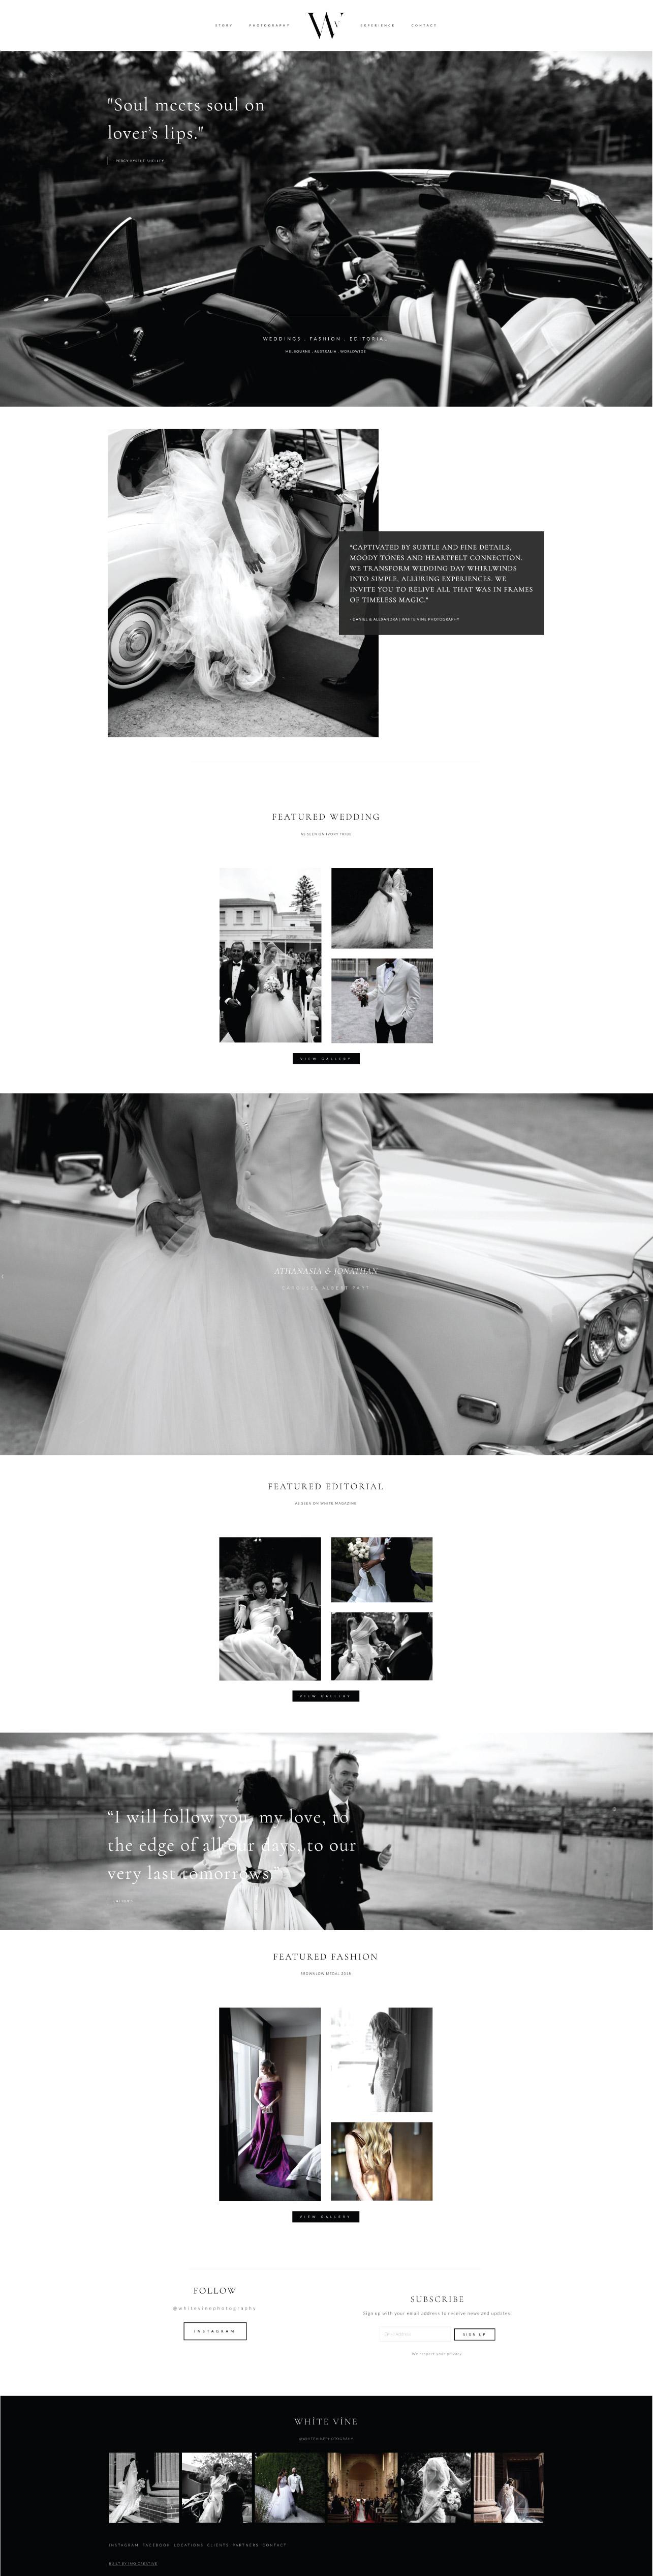 IMO-CREATIVE-Branding-and-Squarespace-Website-Design-Melbourne-White-Vine-Photography---wedding-Photographer.jpg